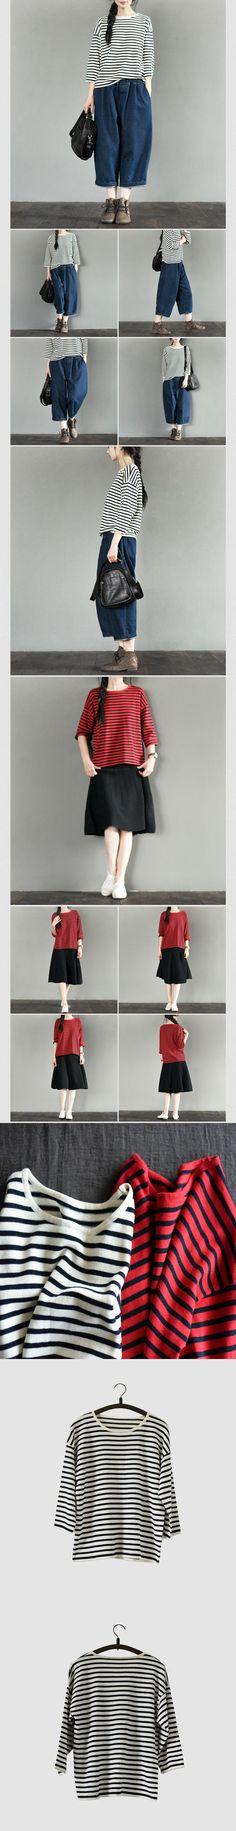 Two Colours Stripe T-shirt Knitwear Cotton Top Summer Blouse Women Clothes